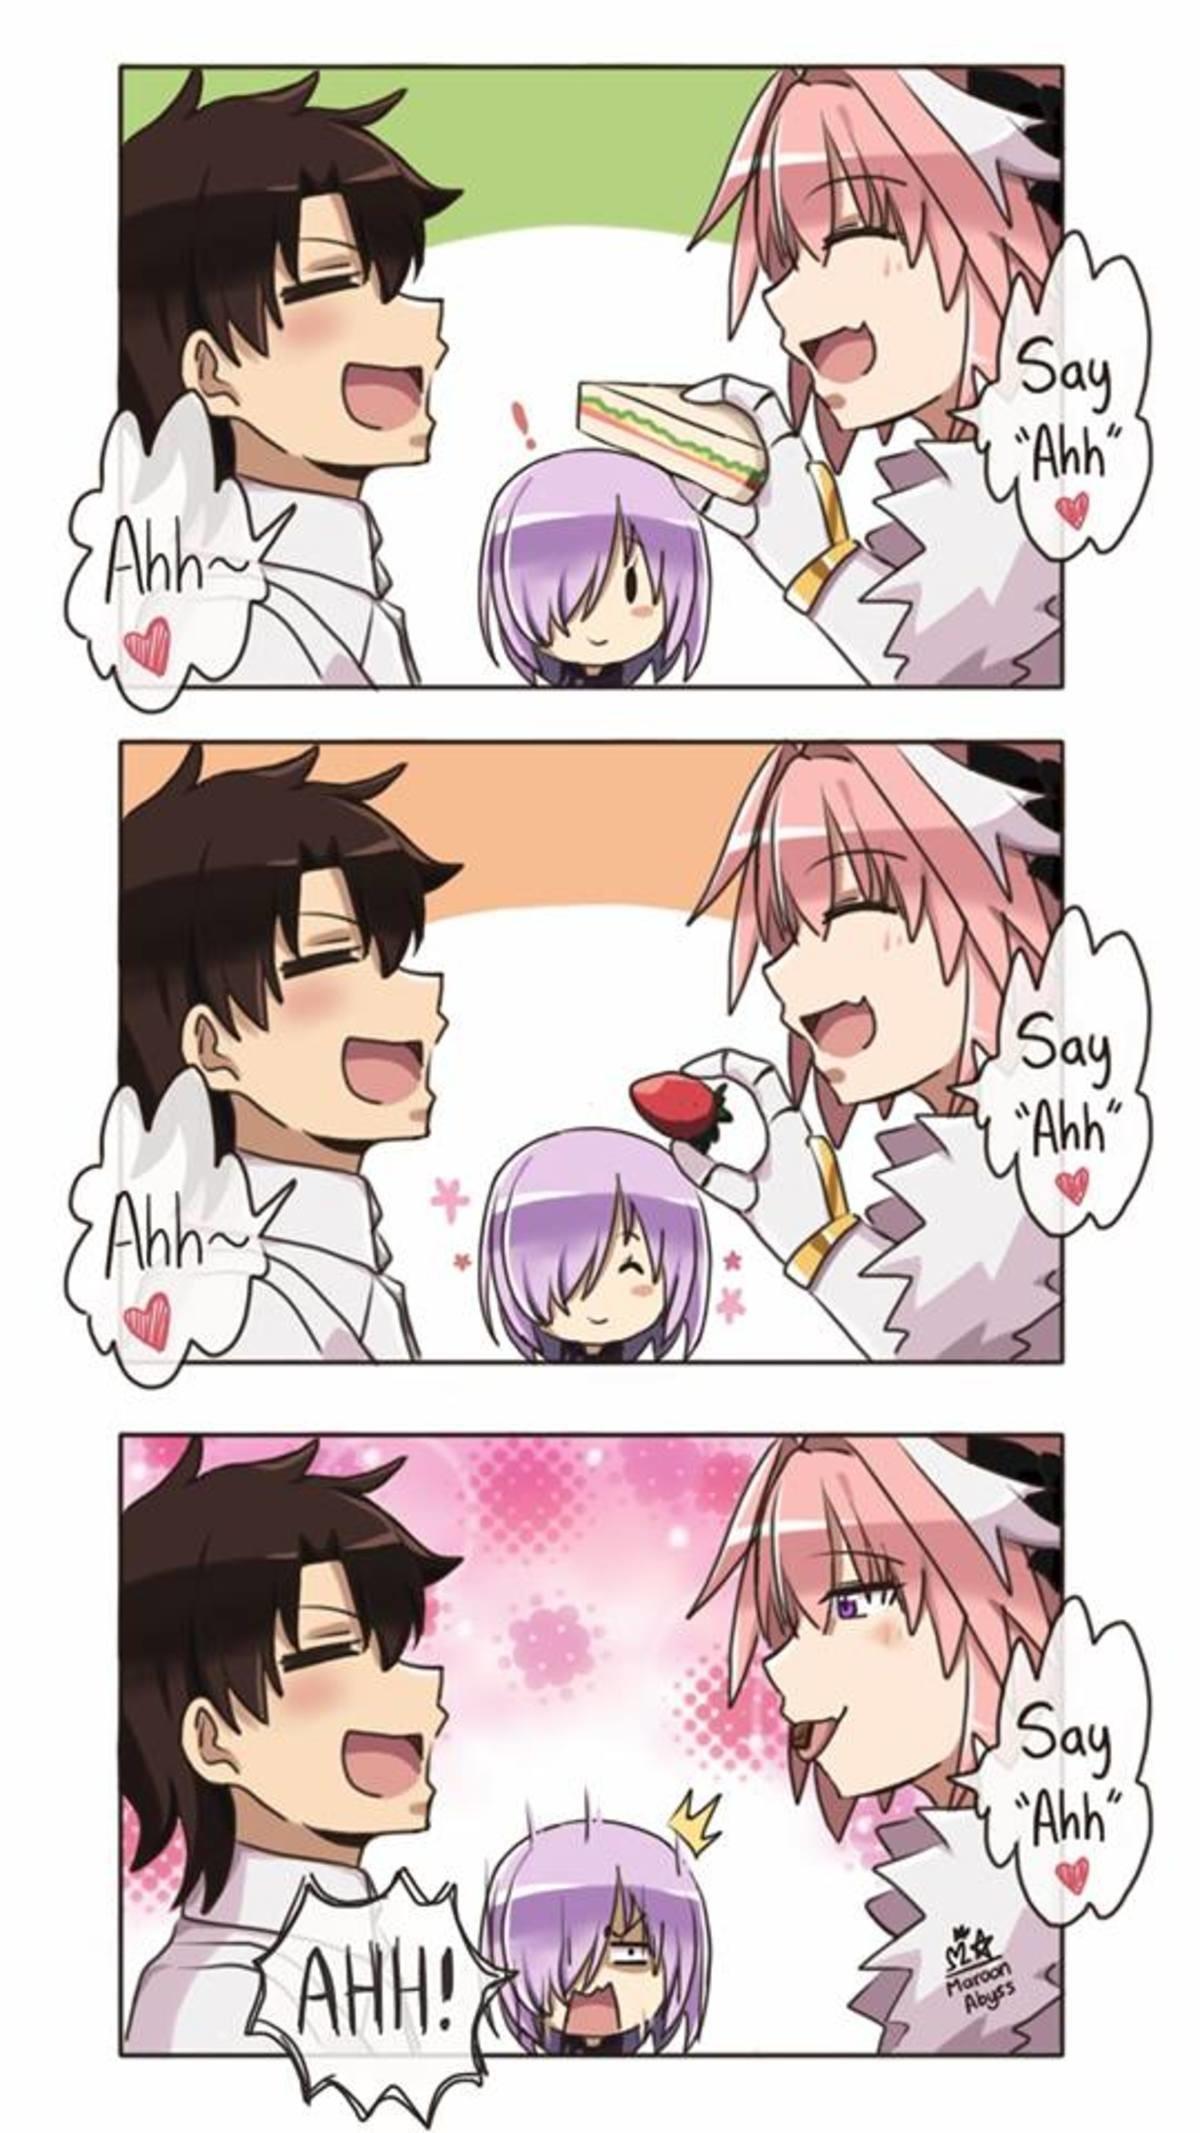 Hey Yo Das Gay Mane. www.pixiv.net/member_illust.php?mode=... . Anime manga fate astolfo